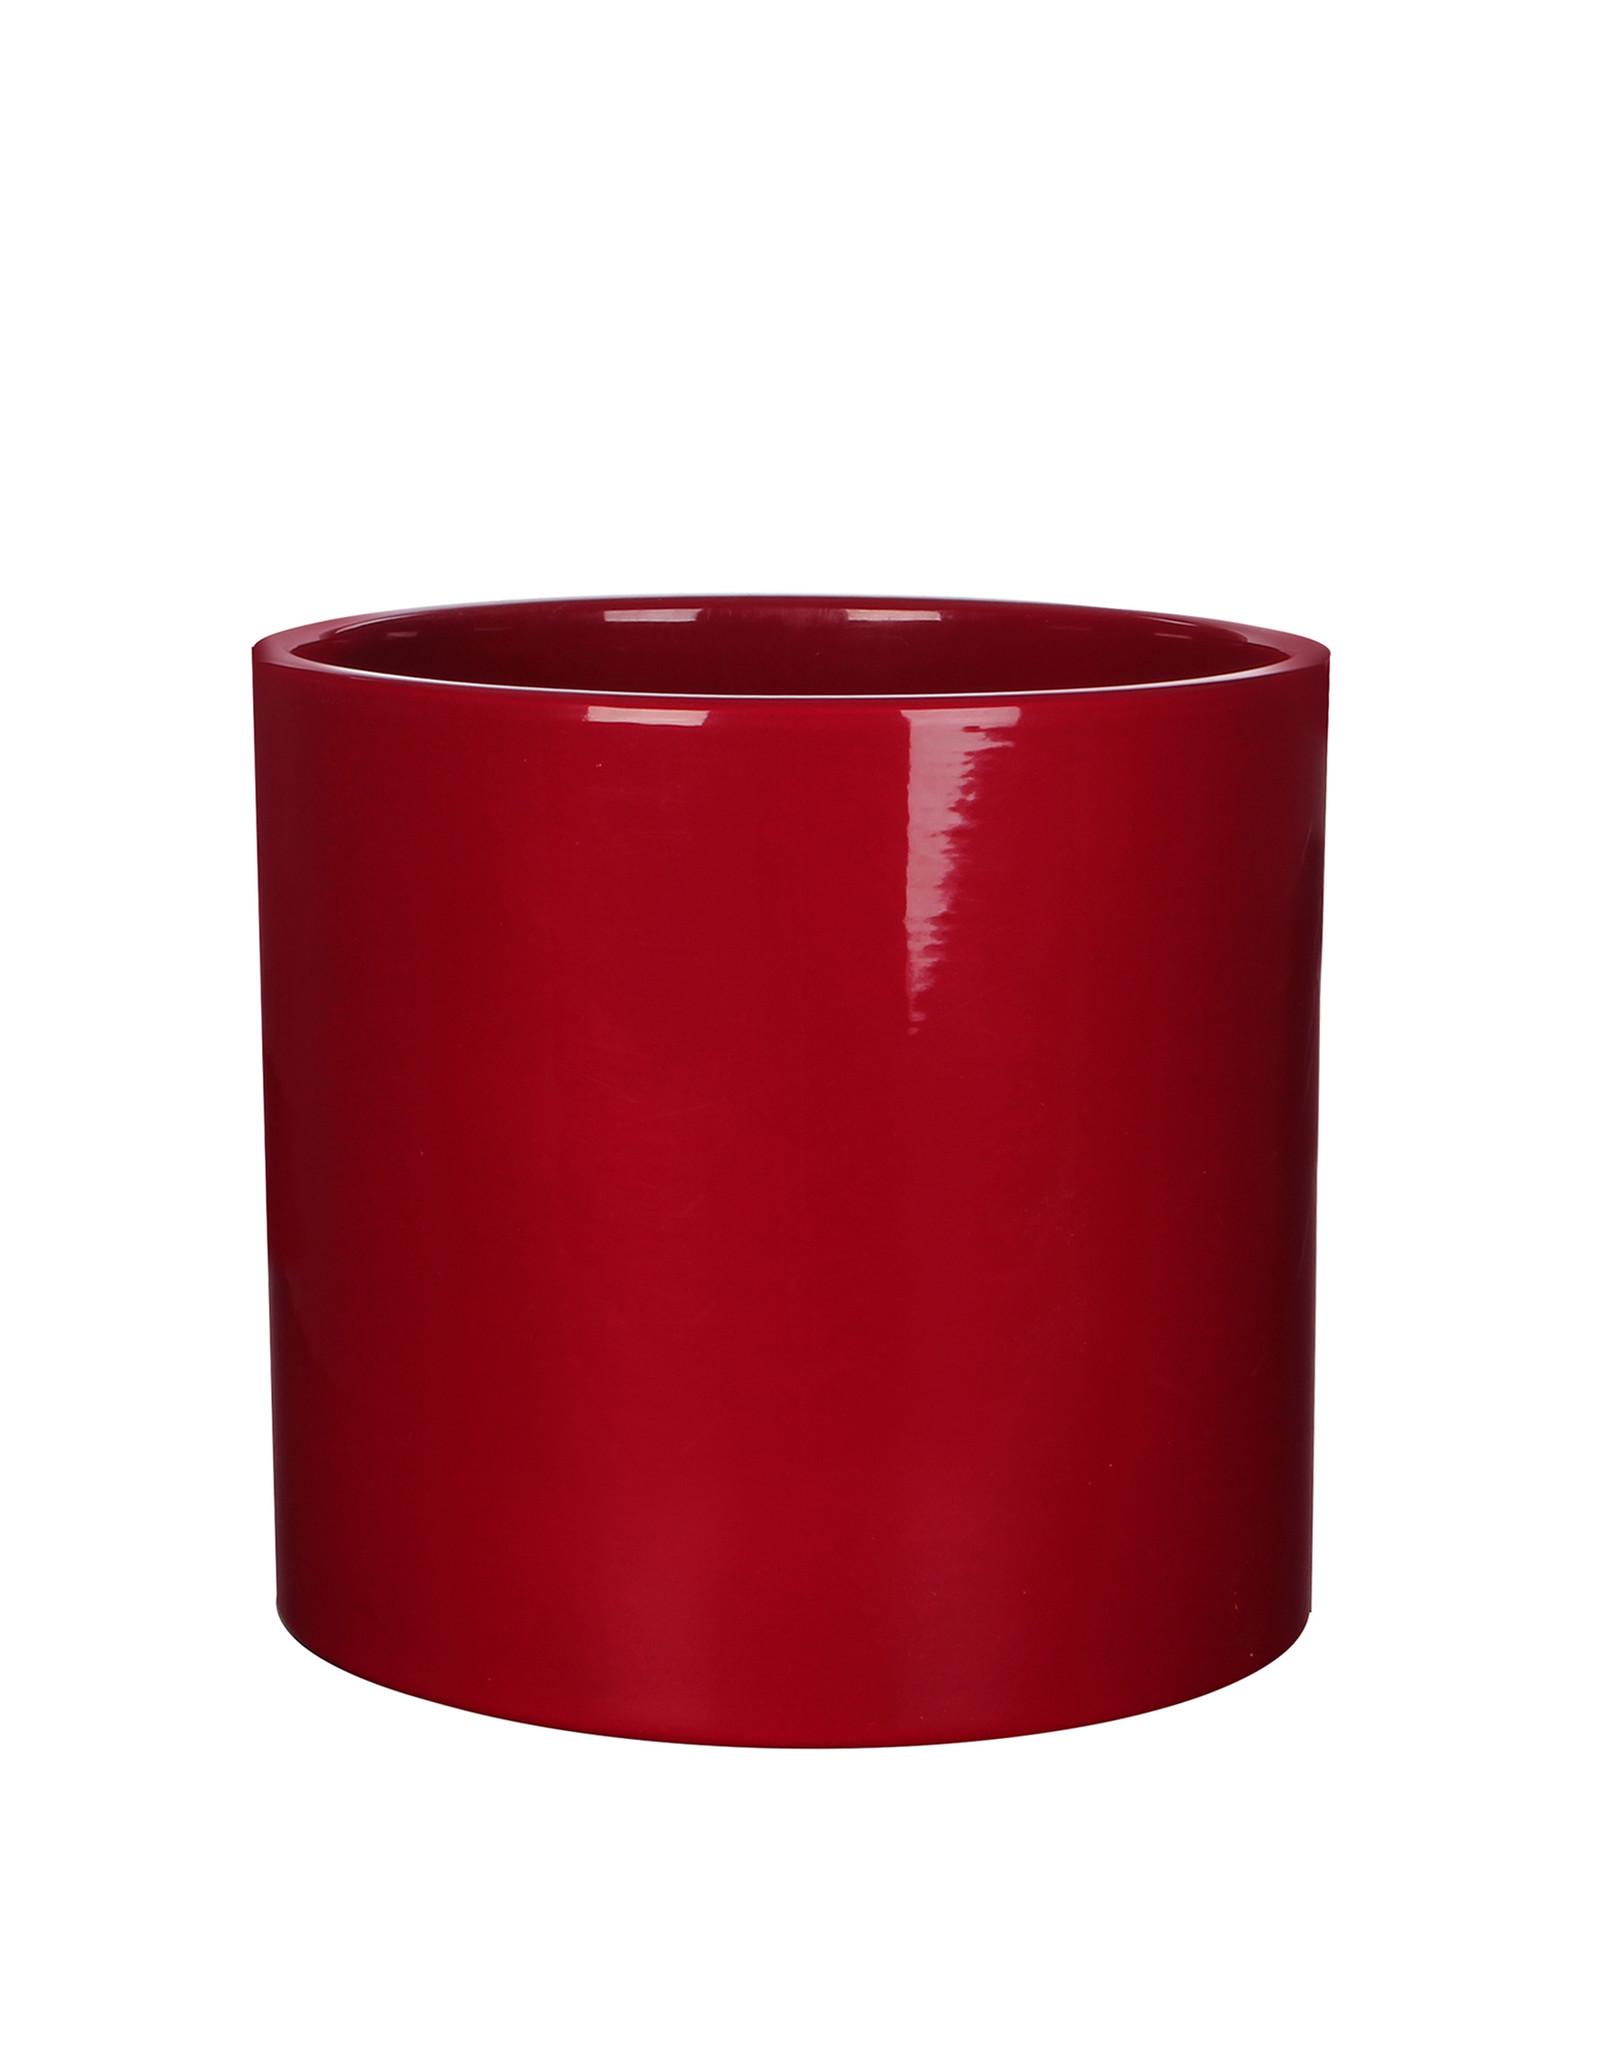 Era Pot Round Relief